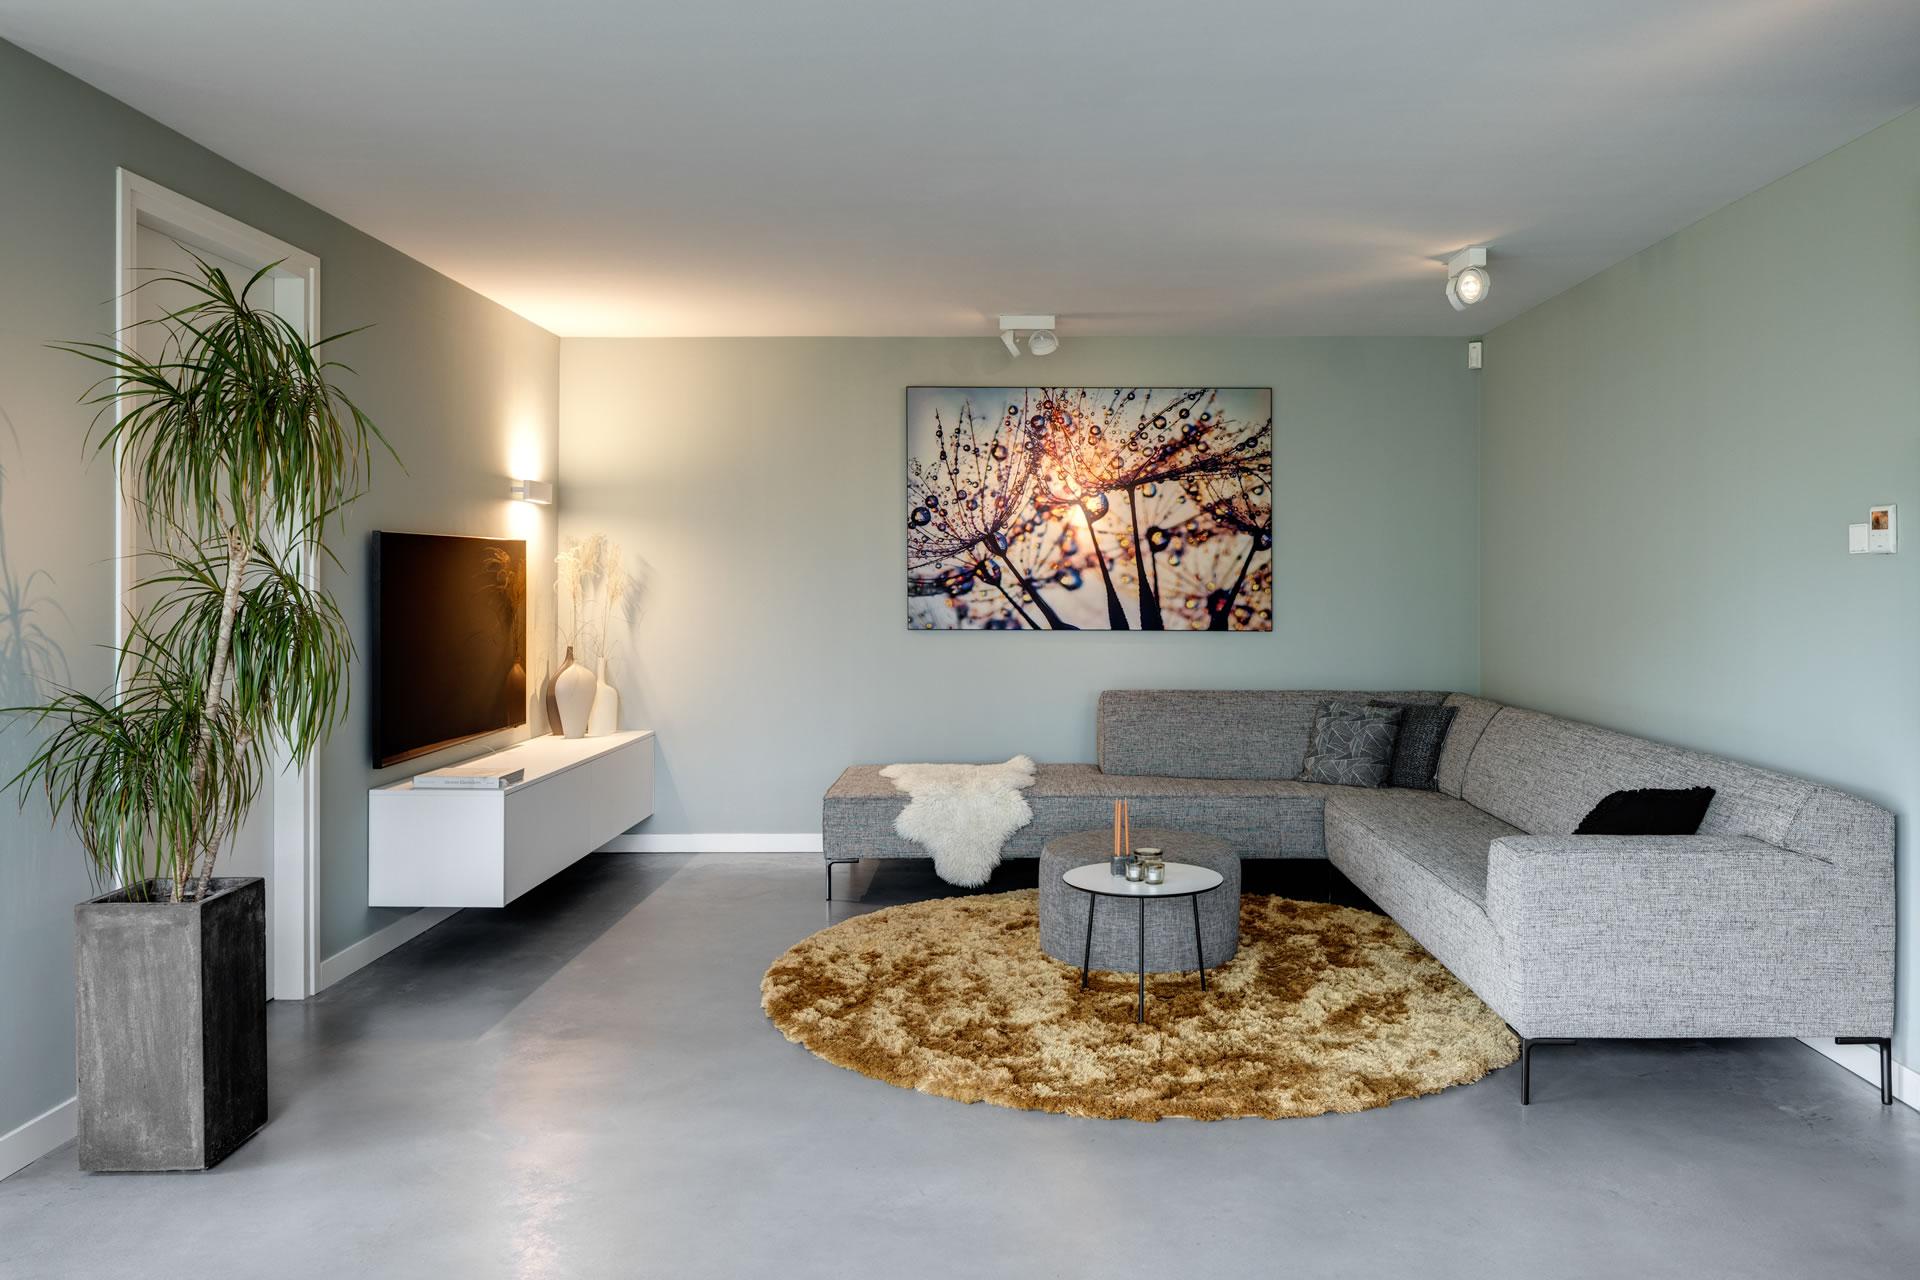 Goossens Stucwerken - Paul Sloven (Art of Living) - Highlight - 2321